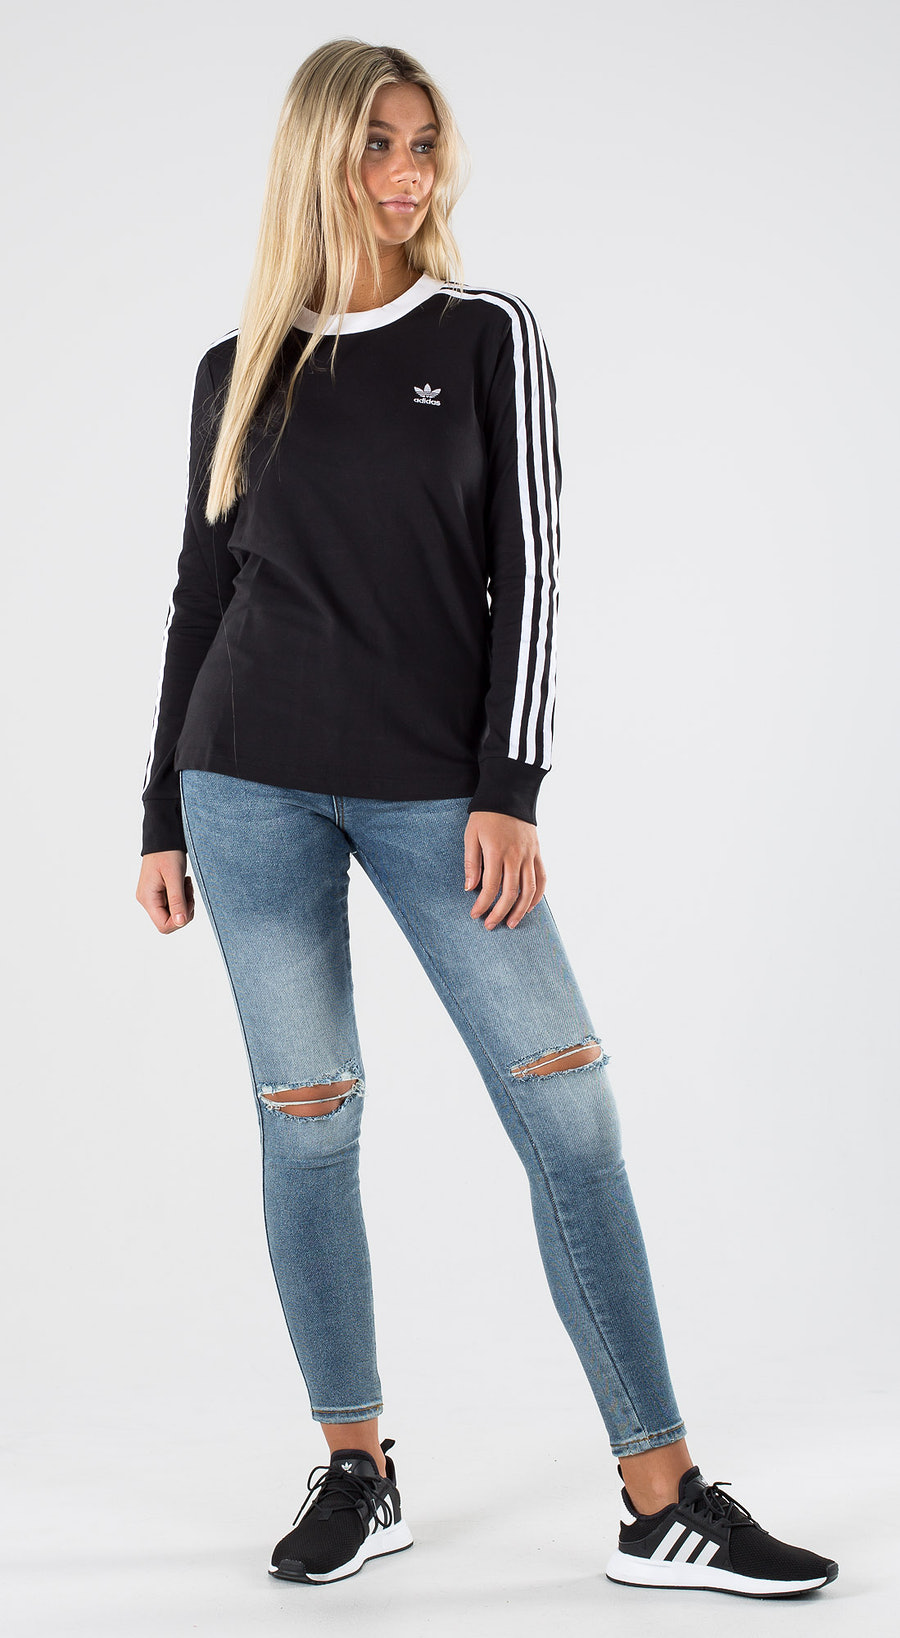 Adidas Originals 3 Stripe Longsleeve Black White Outfit Multi